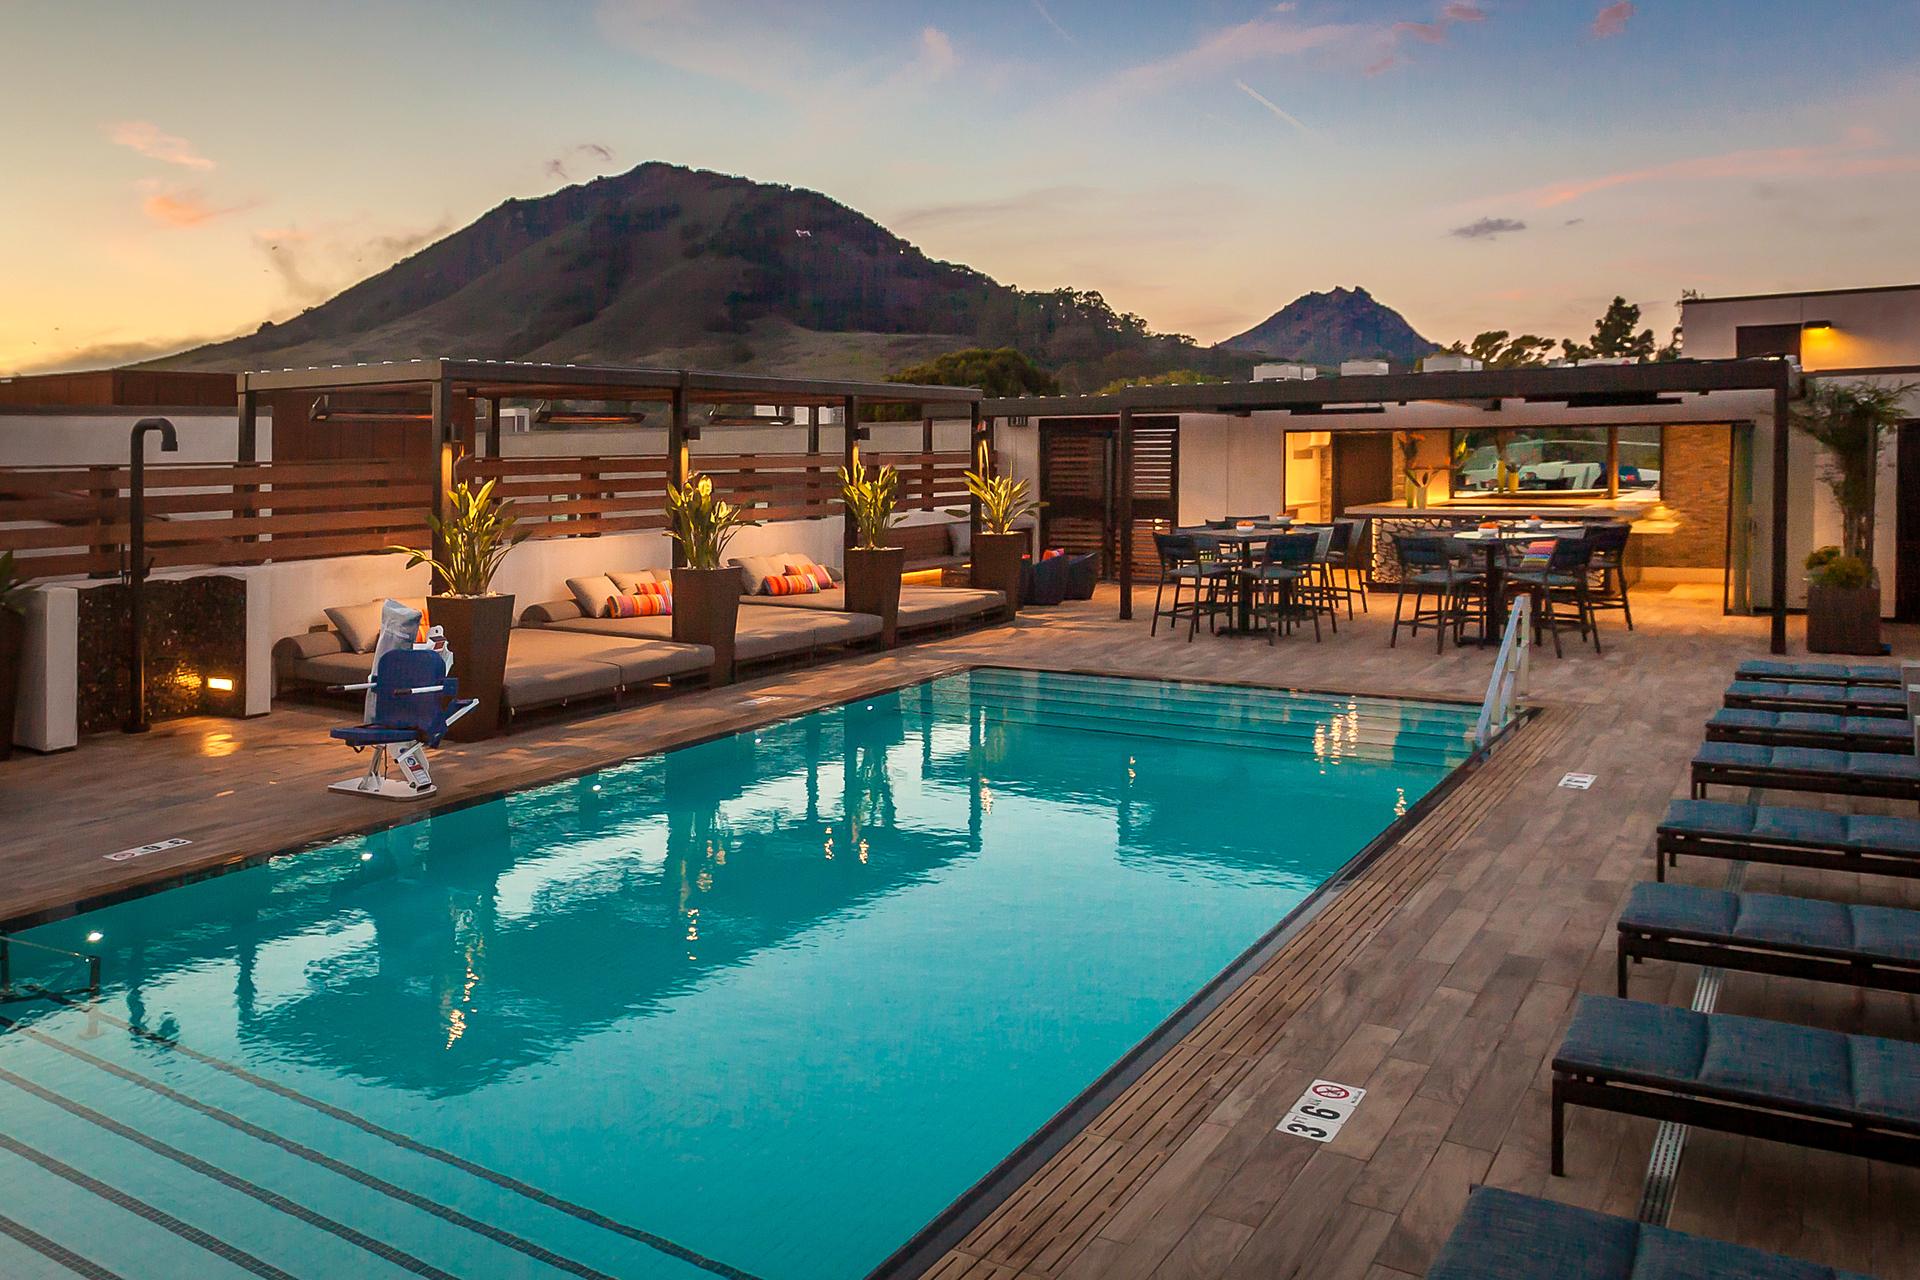 Aqua Design International Hotel Cerro Hospitality Design Rooftop Swimming Pool Pergola Lighting Ideas